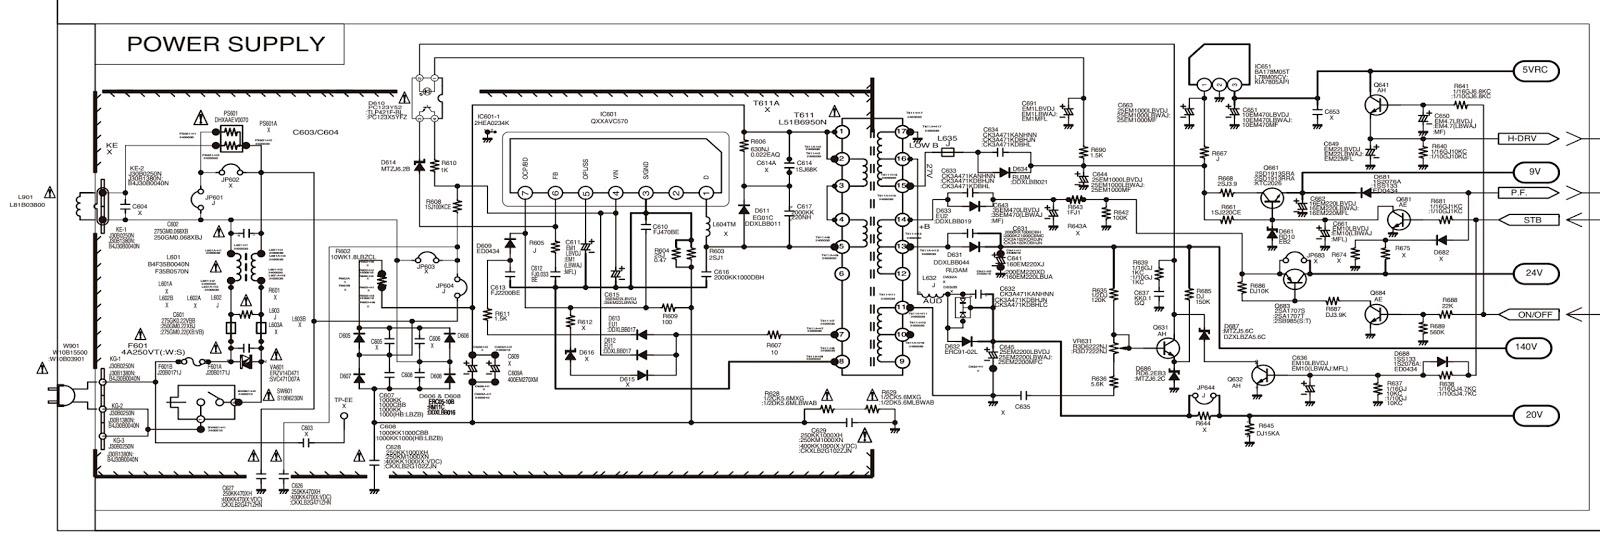 sanyo c29lf41 crt tv circuit diagram [ 1600 x 544 Pixel ]